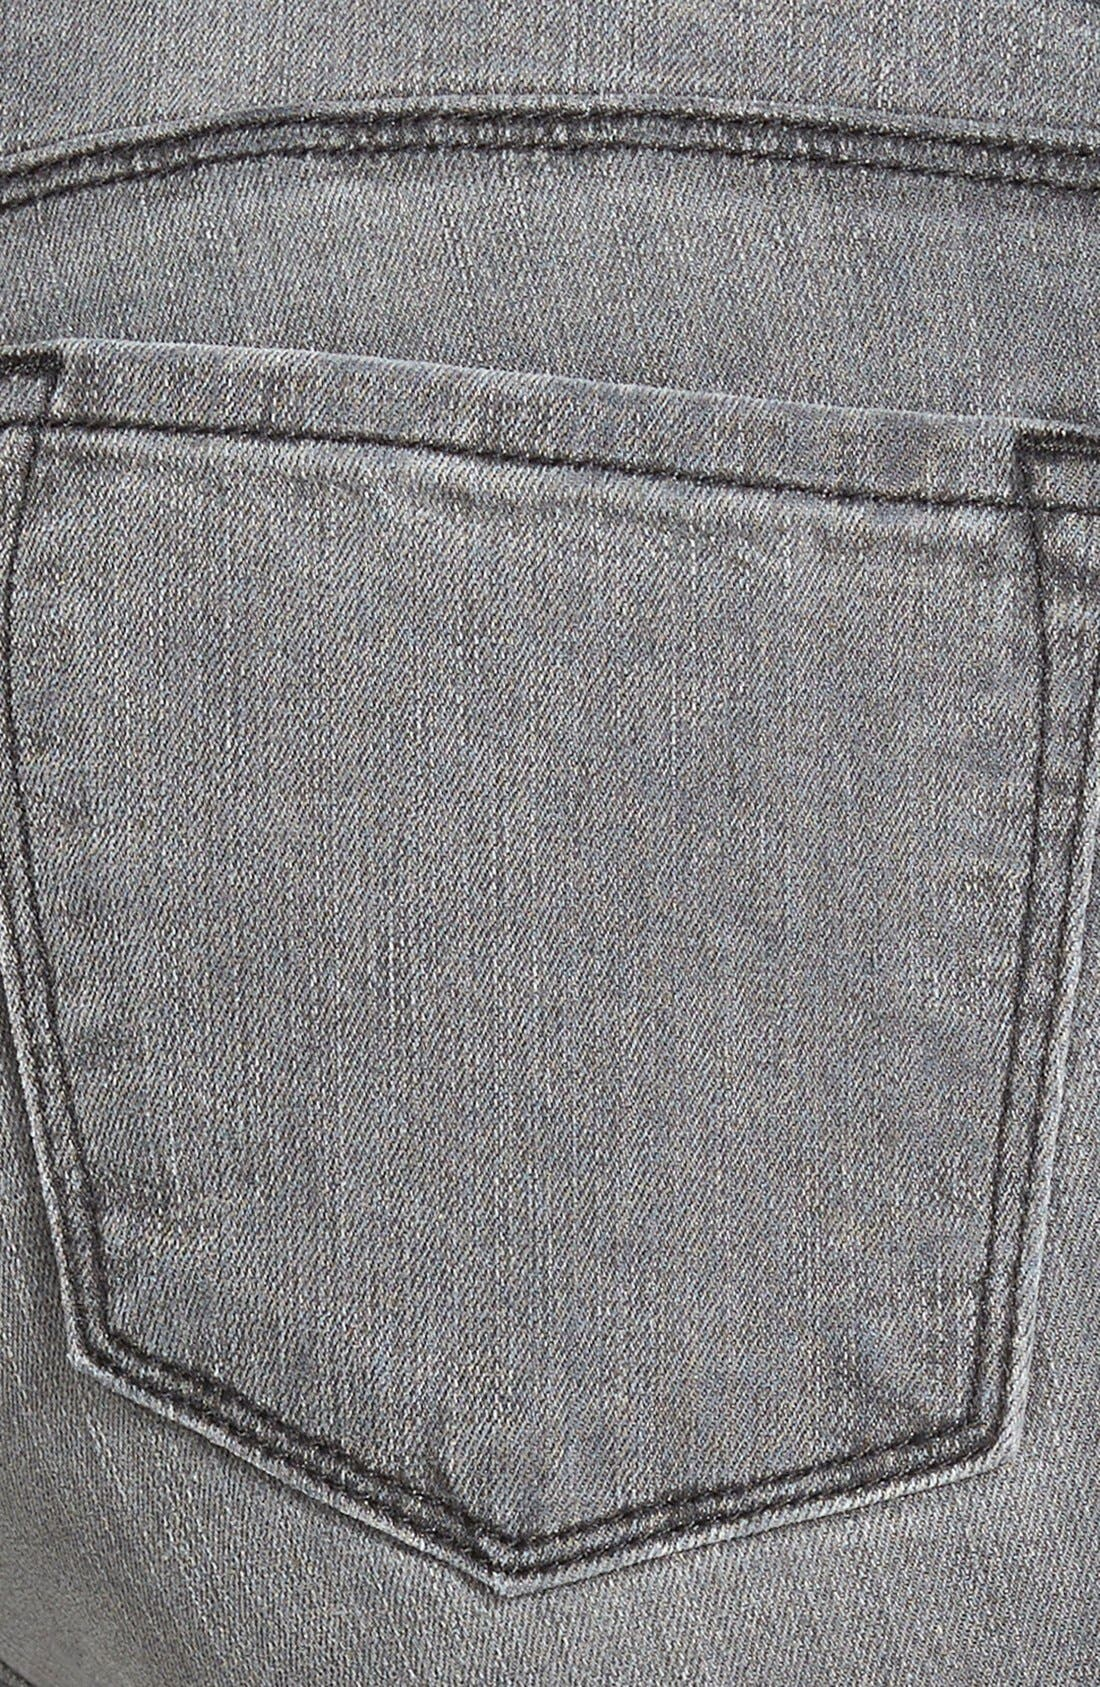 Alternate Image 3  - J Brand '620' Mid Rise Skinny Jeans (Nightbird)